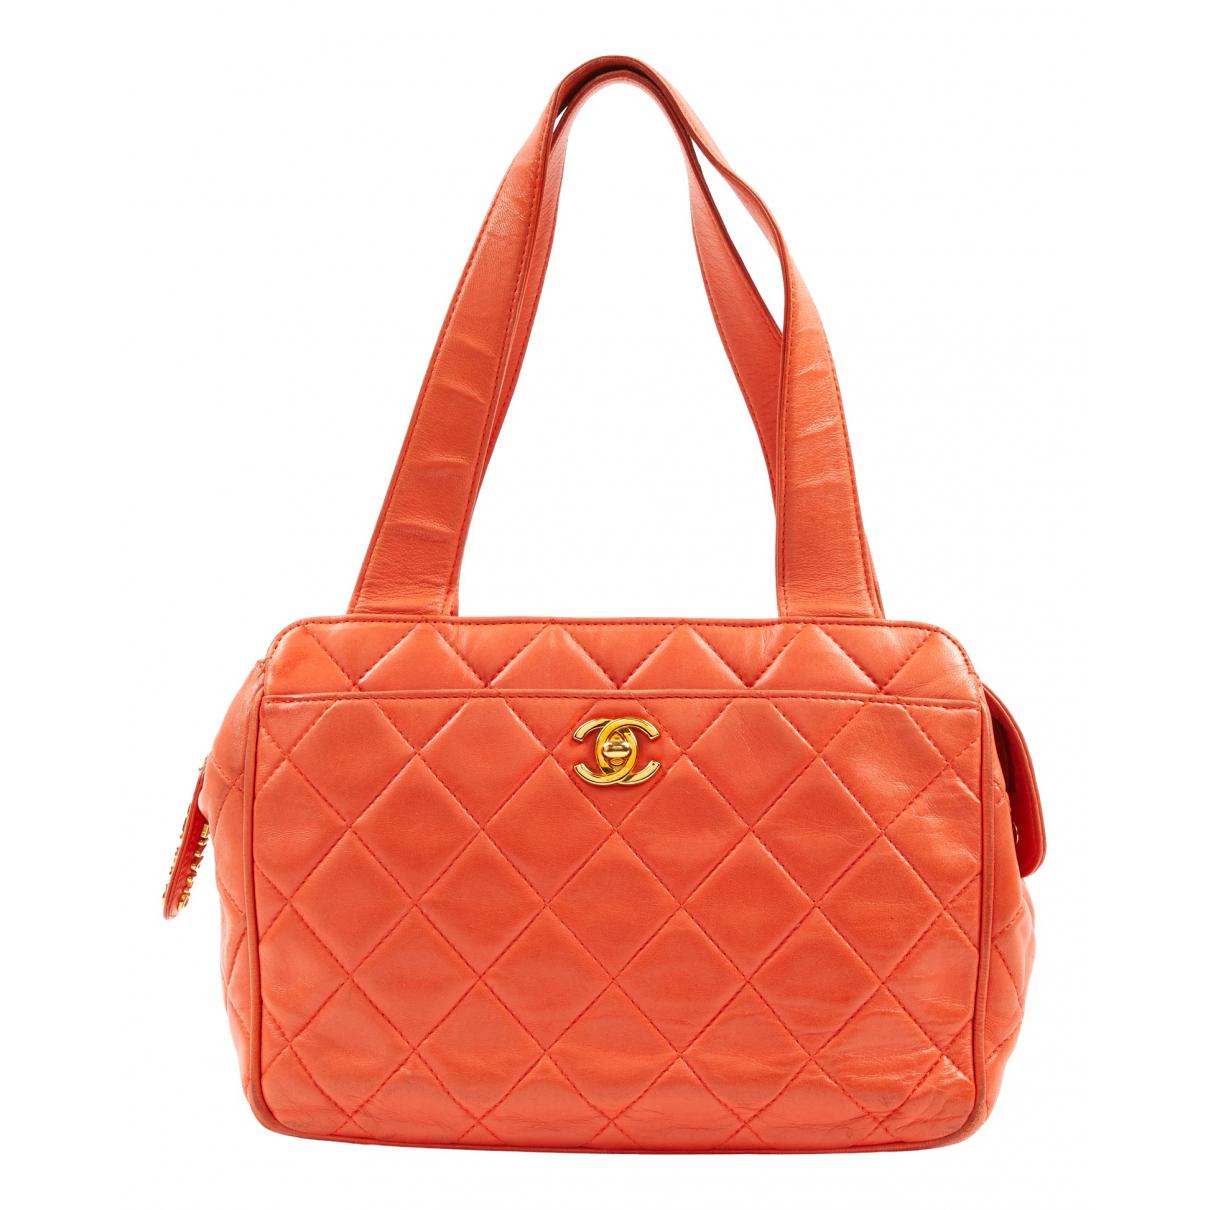 Chanel N Orange Leather handbag for Women N